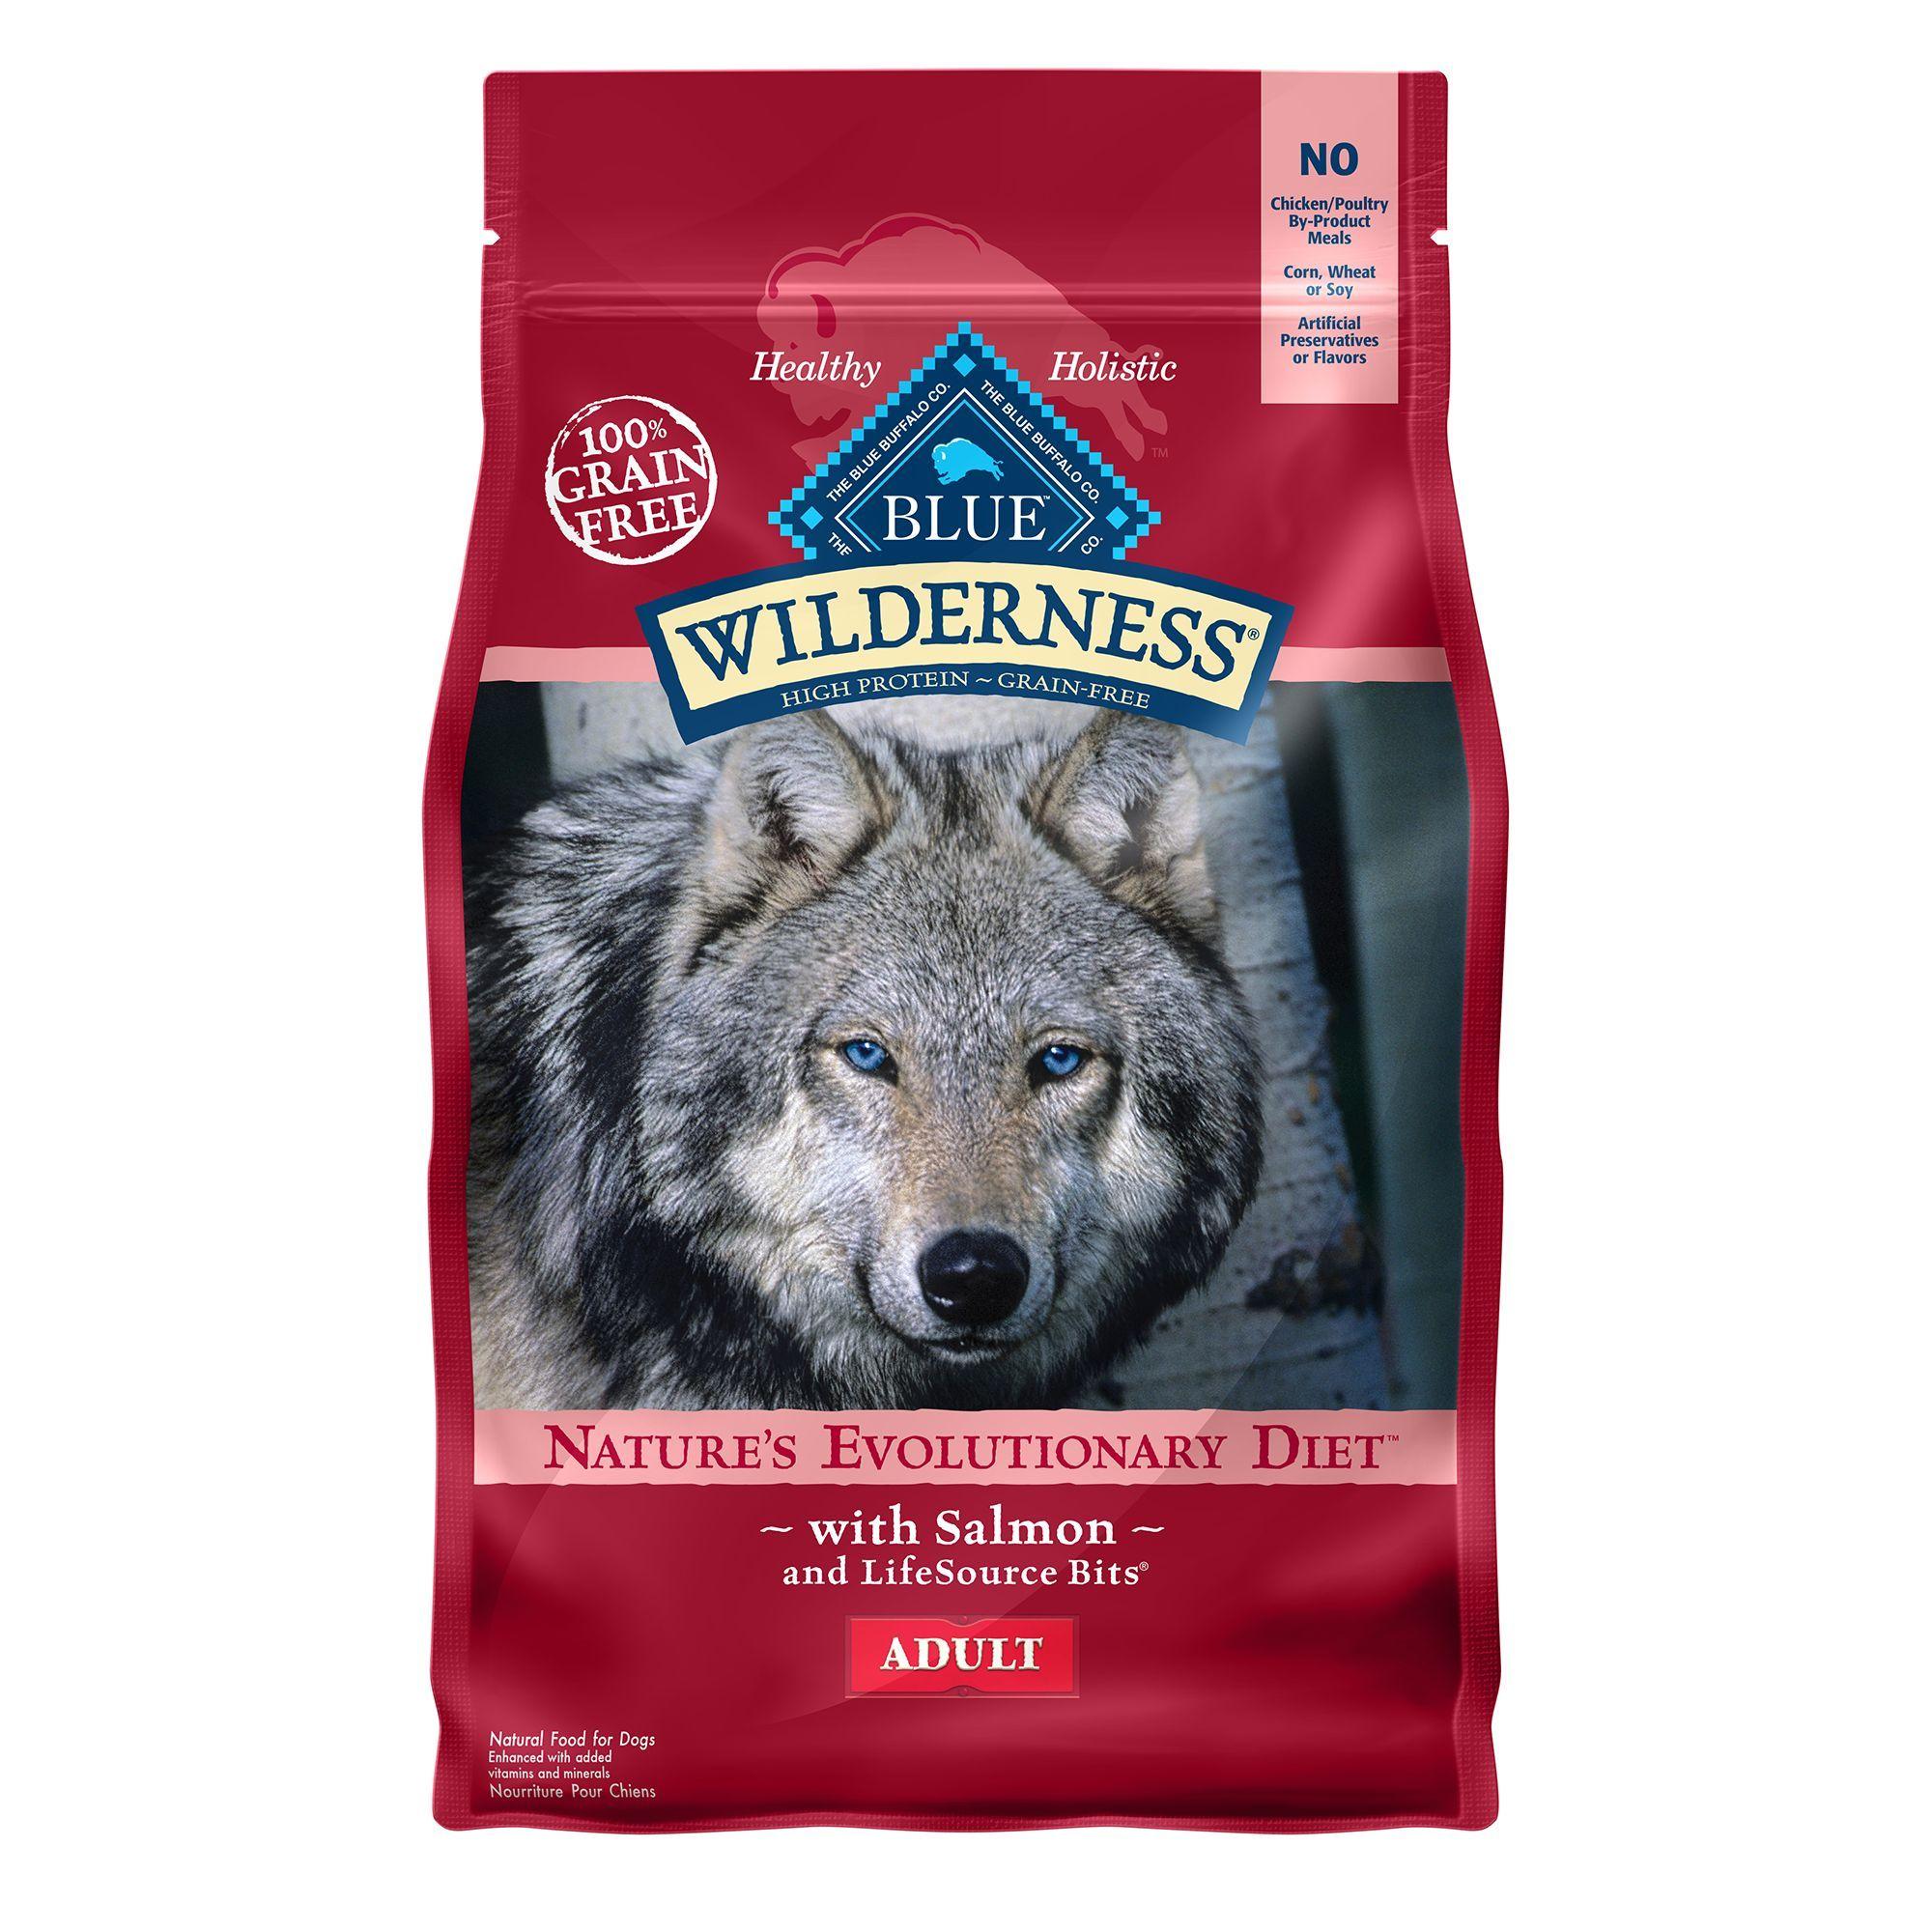 Blue Buffalo Wilderness Adult Dog Food Grain Free Natural